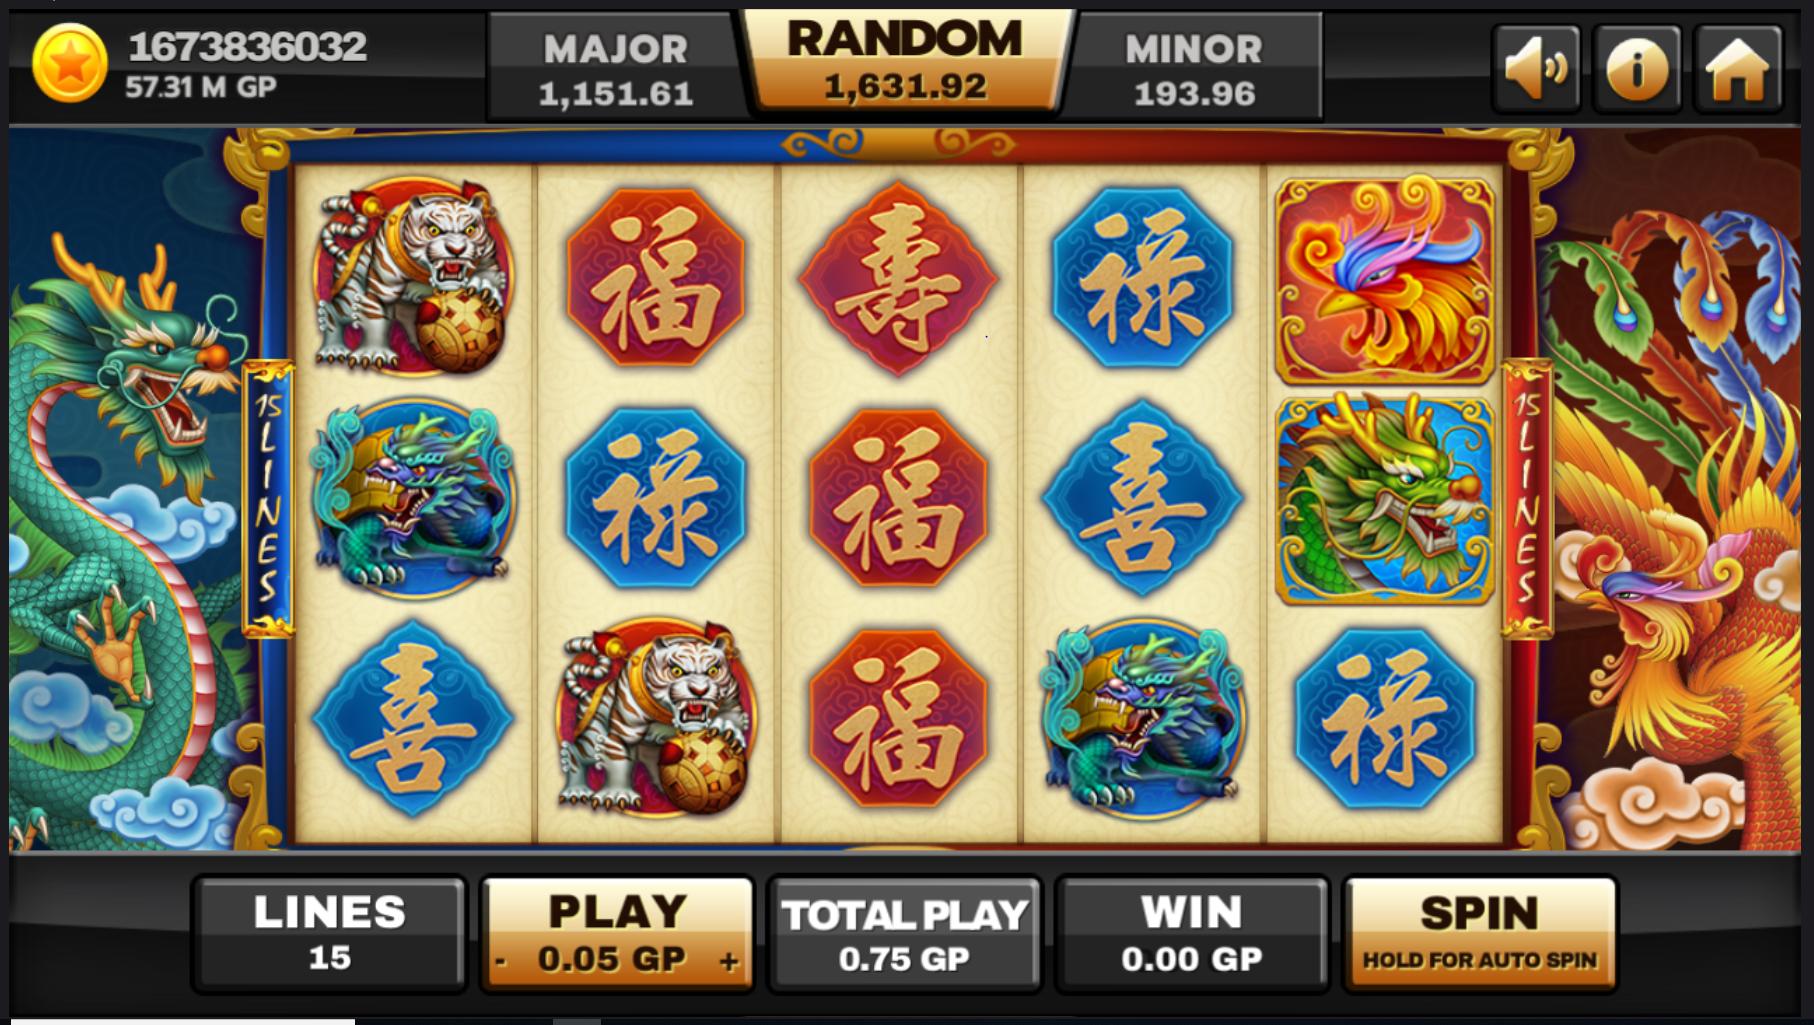 Ways to win at slot games